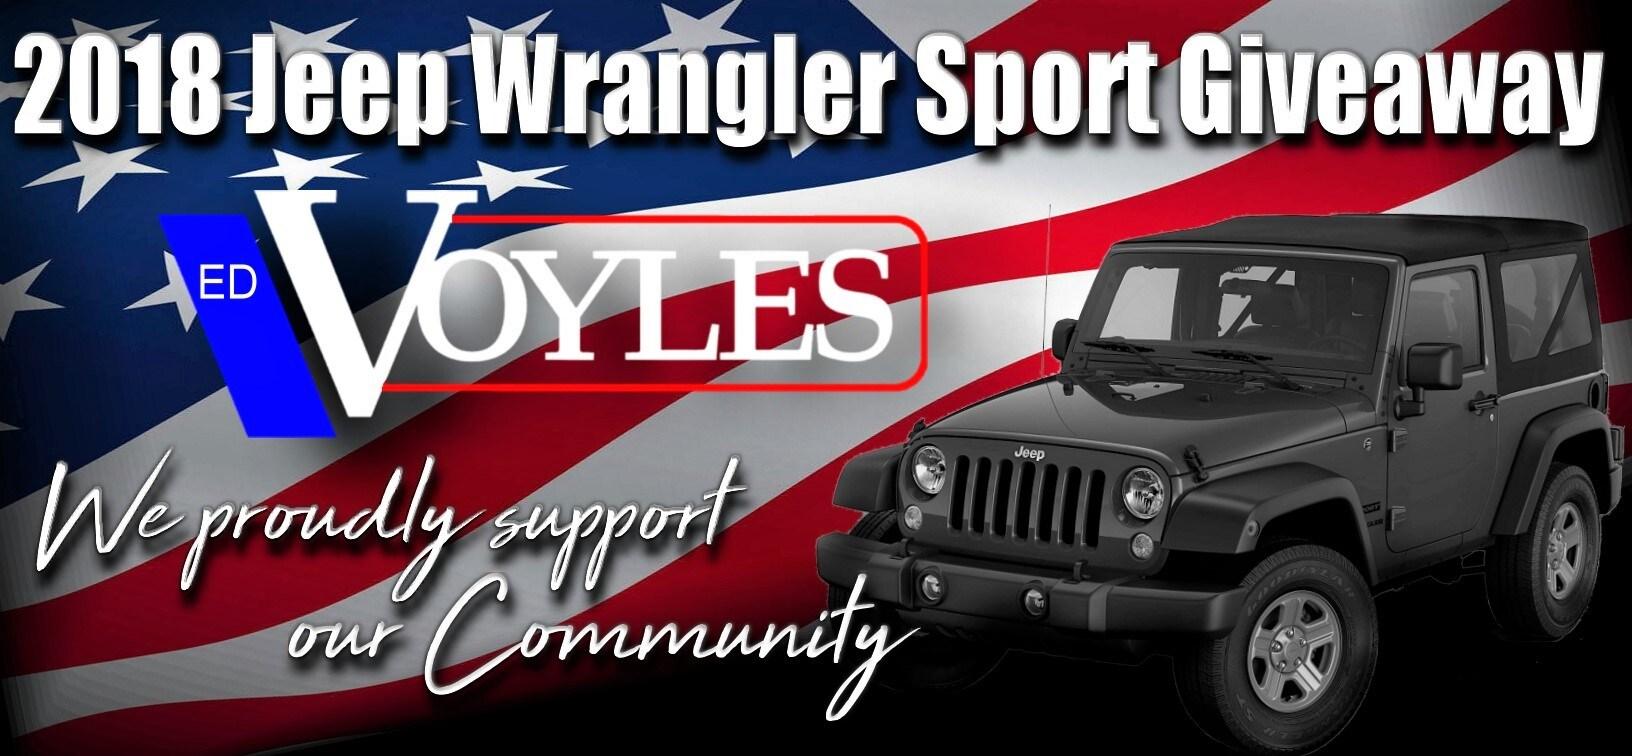 Ed Voyles Chrysler Dodge Jeep Ram | New Chrysler, Jeep, Dodge, Ram